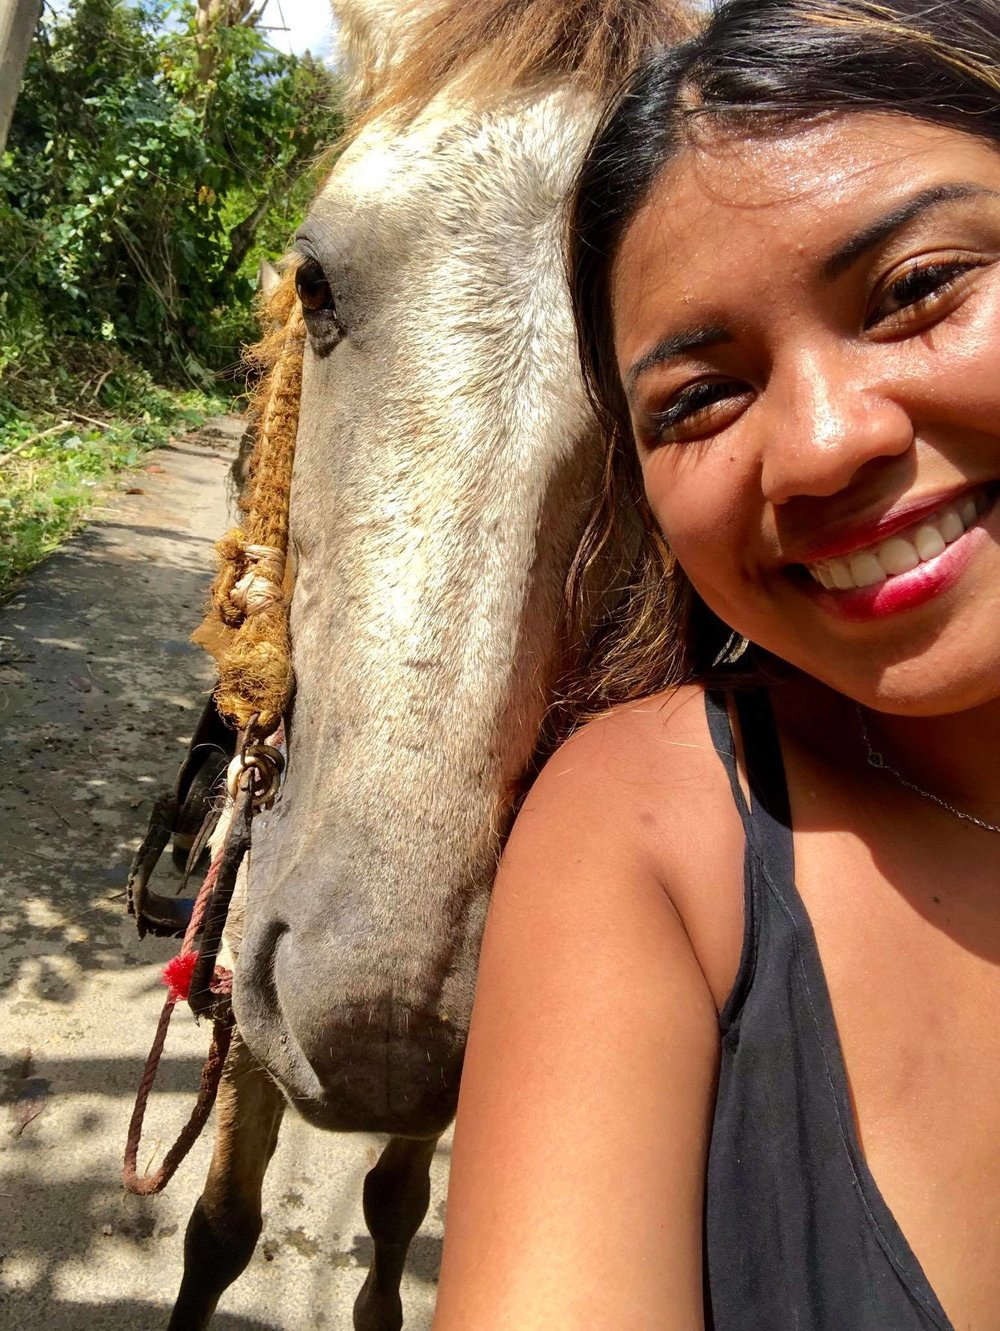 Liveaboard Life Day 261: SAMANA 😍